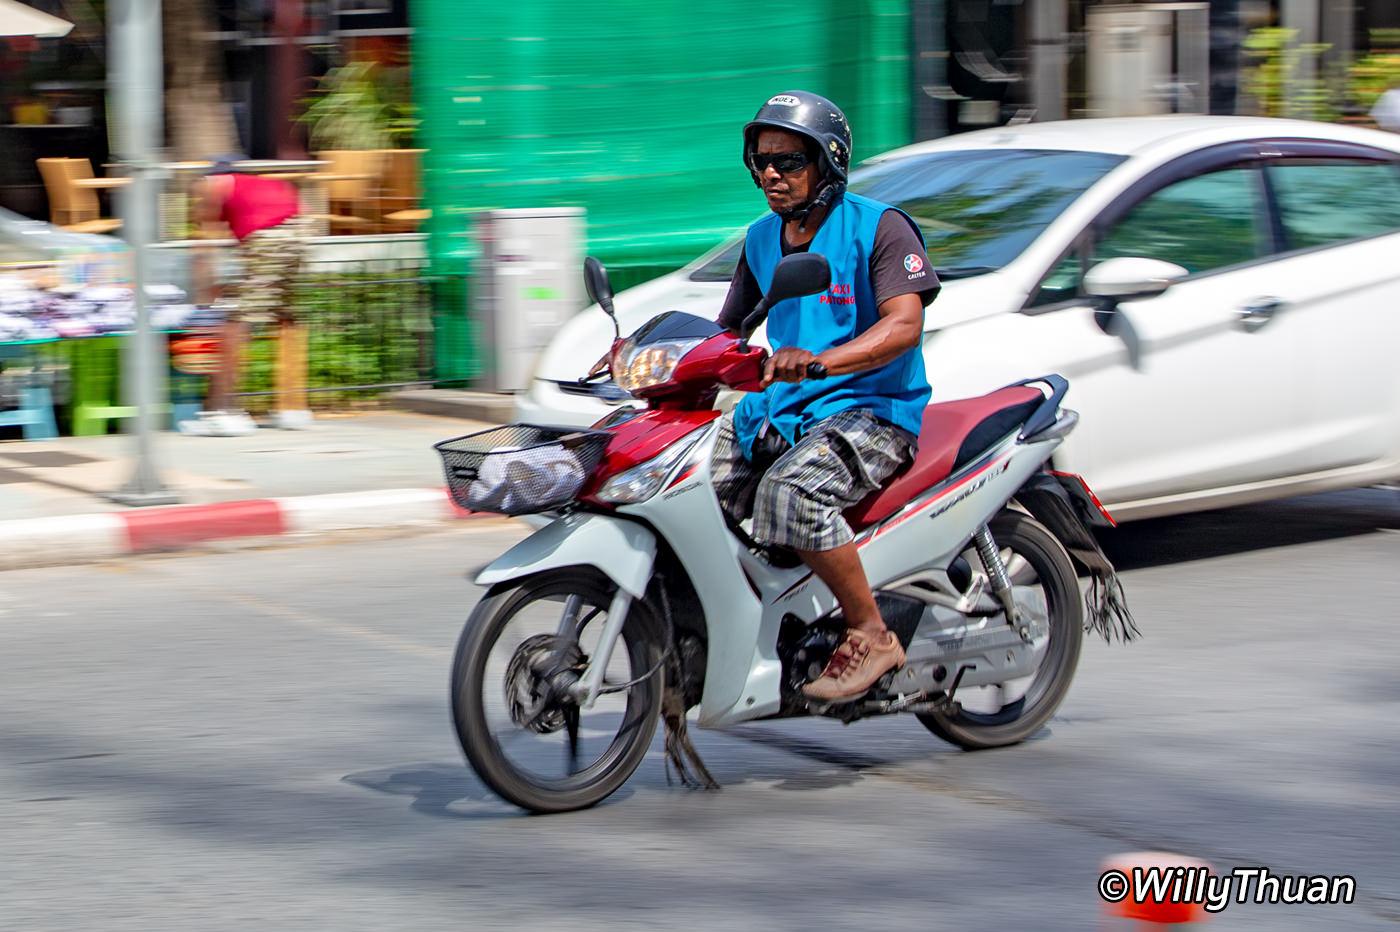 Phuket Taxis, Tuk Tuks and Buses - Getting Around Phuket